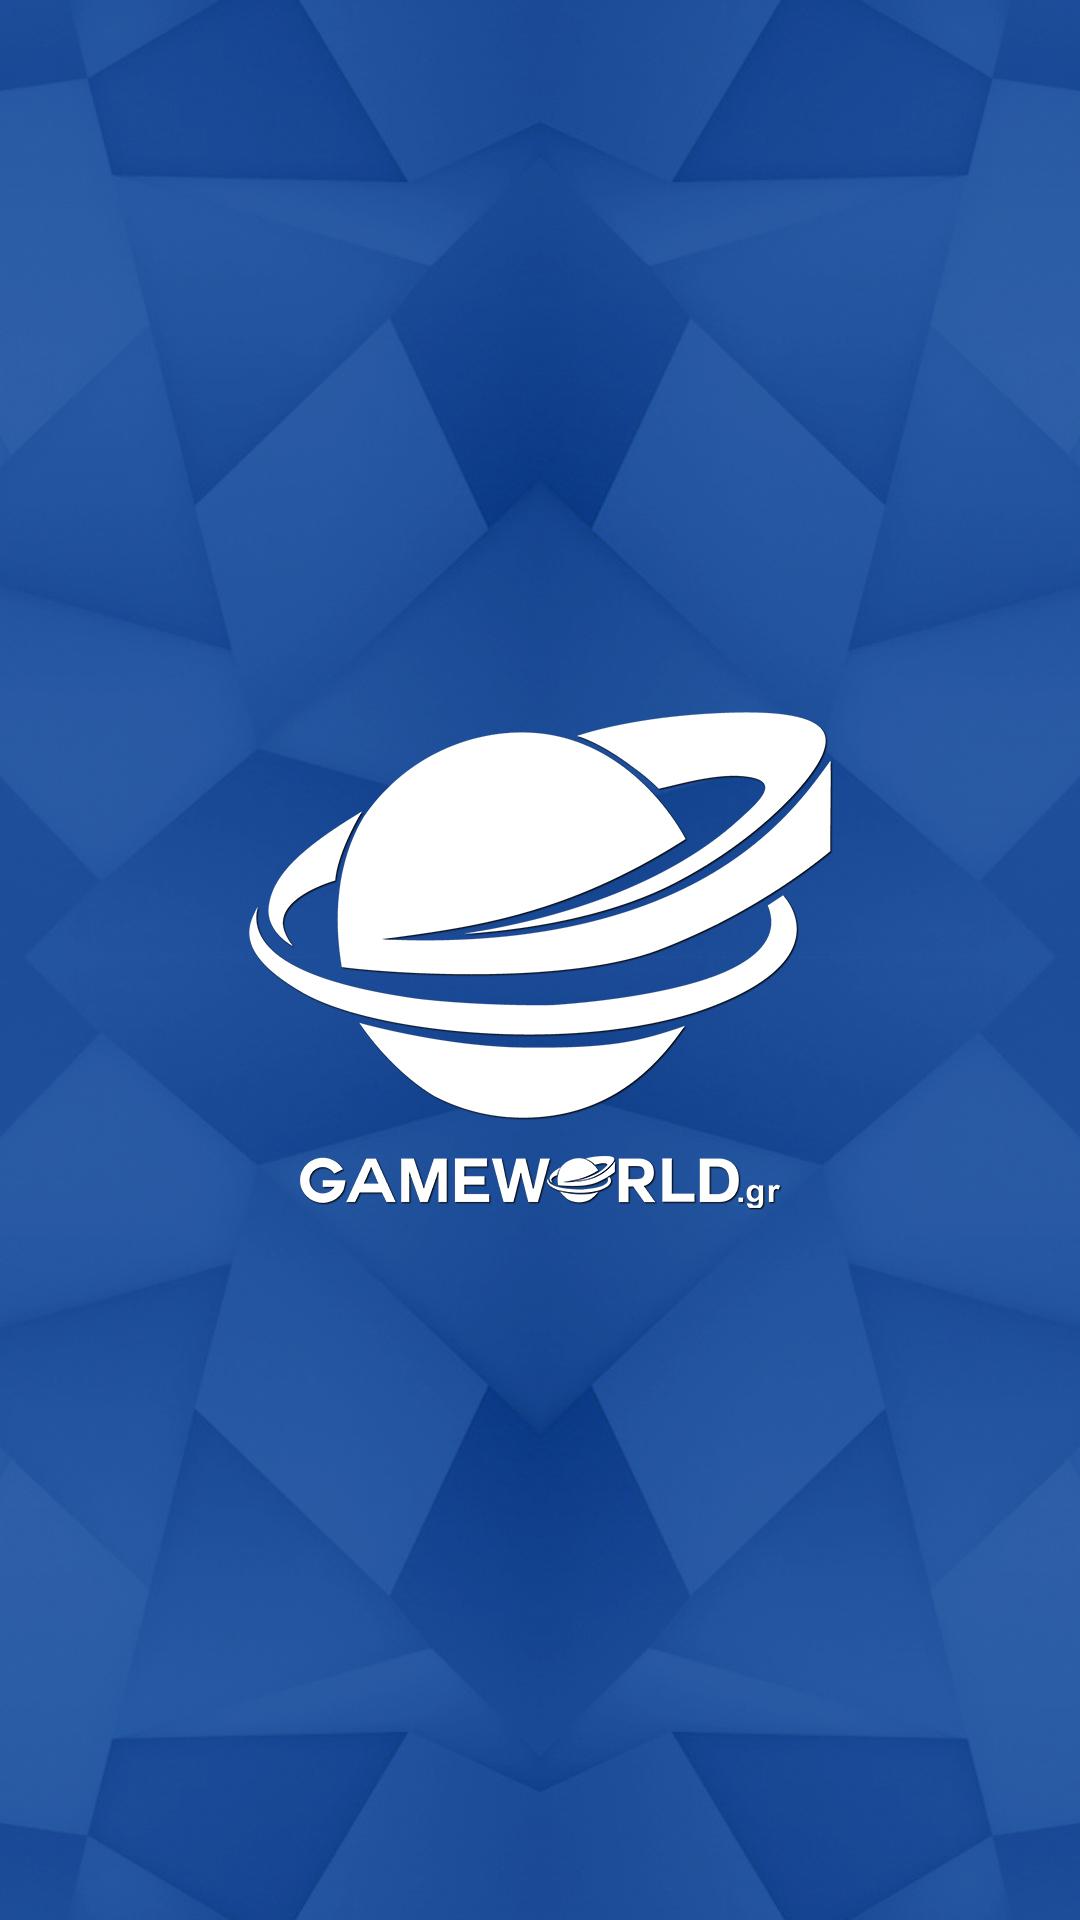 gameworld-smartphone-wallpaper.jpg